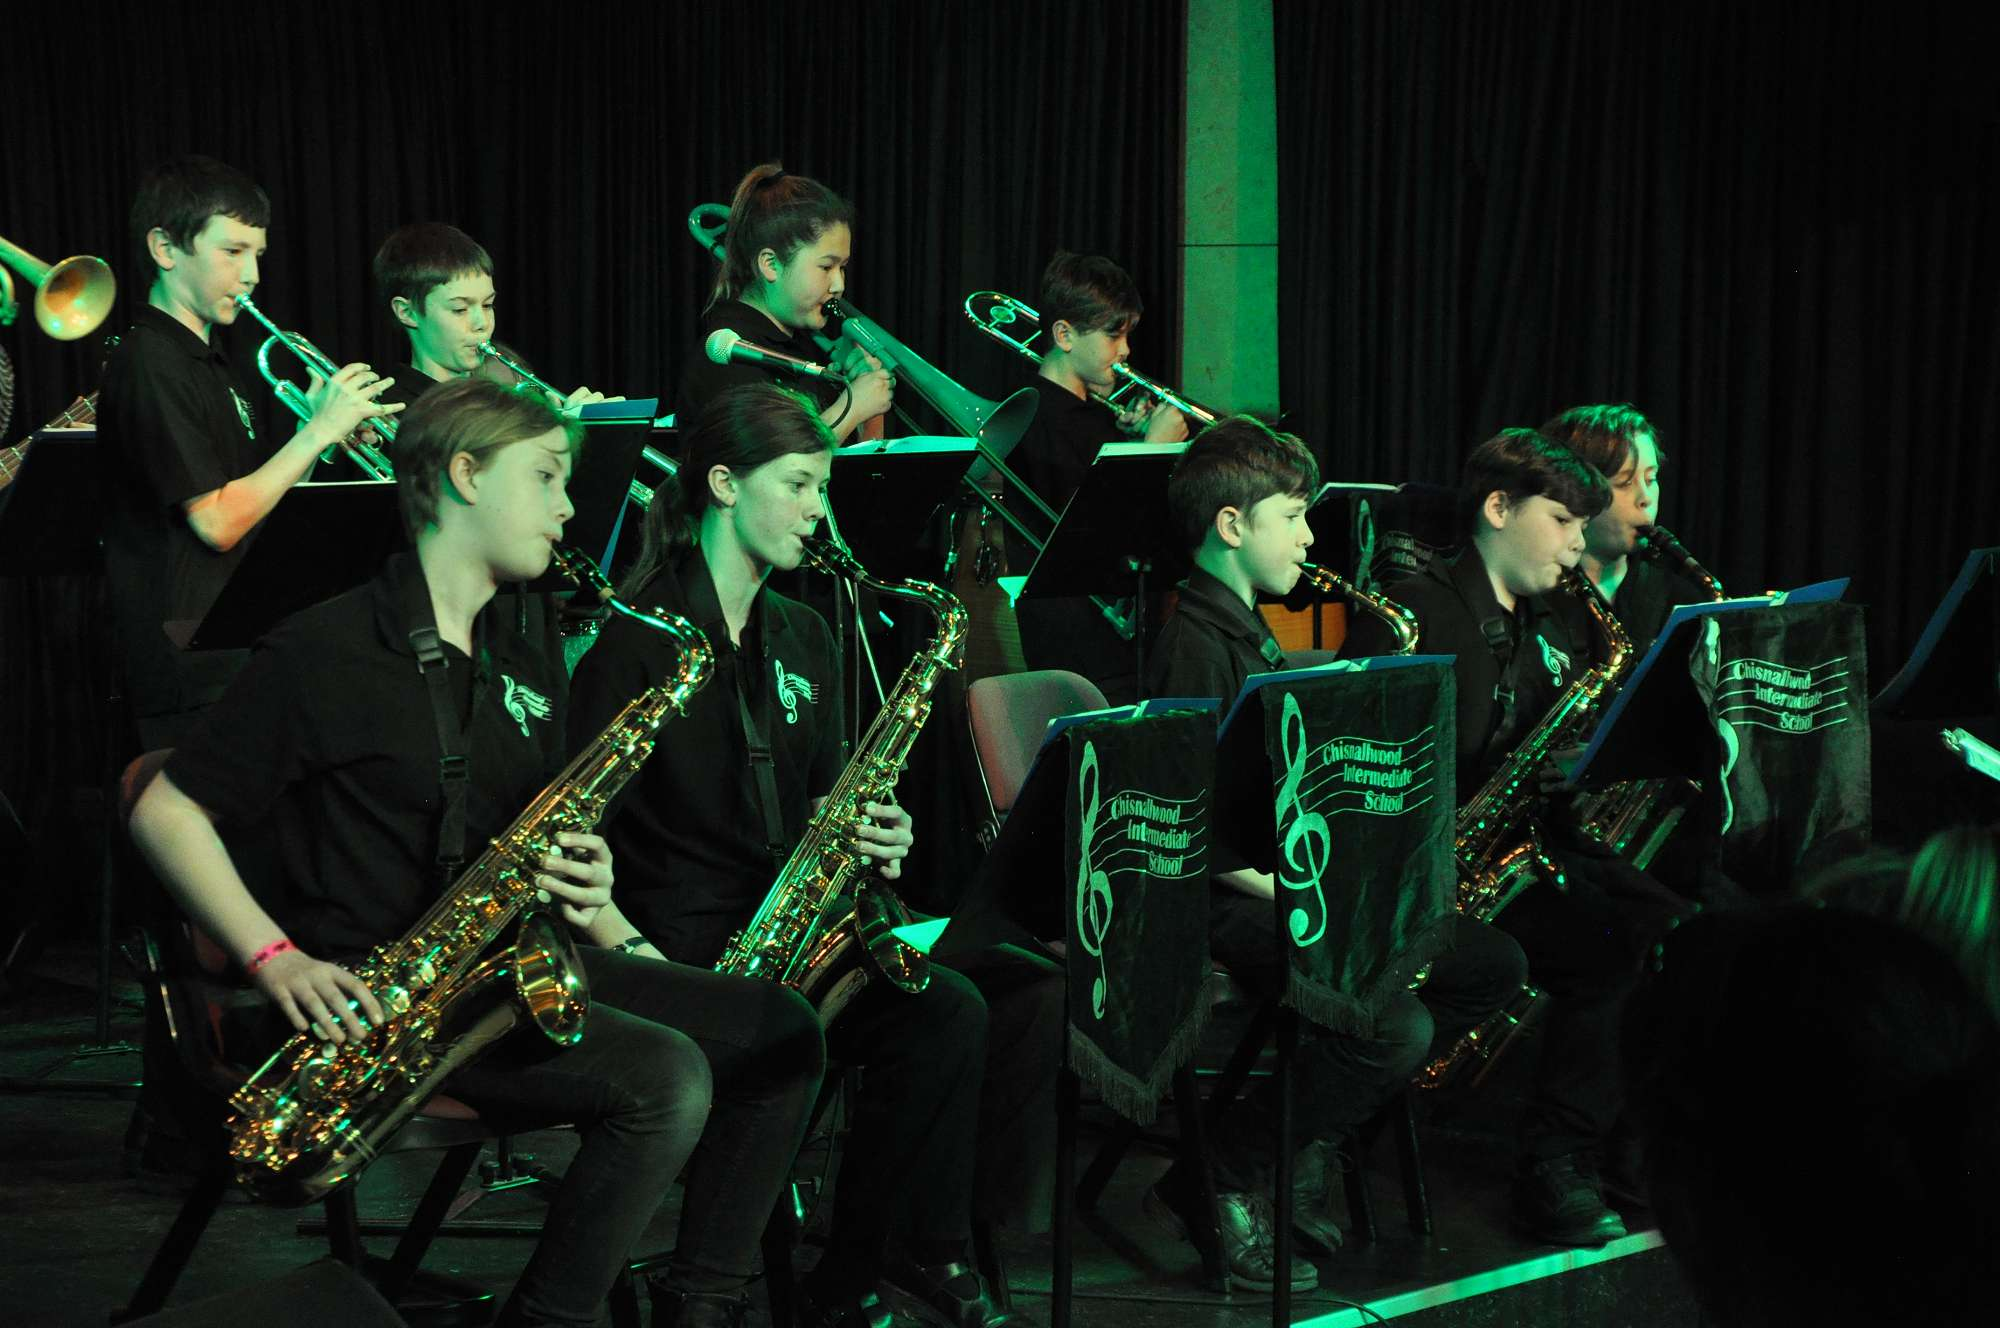 Chisnallwood Jazz Band performing at Junior Jazz Jam